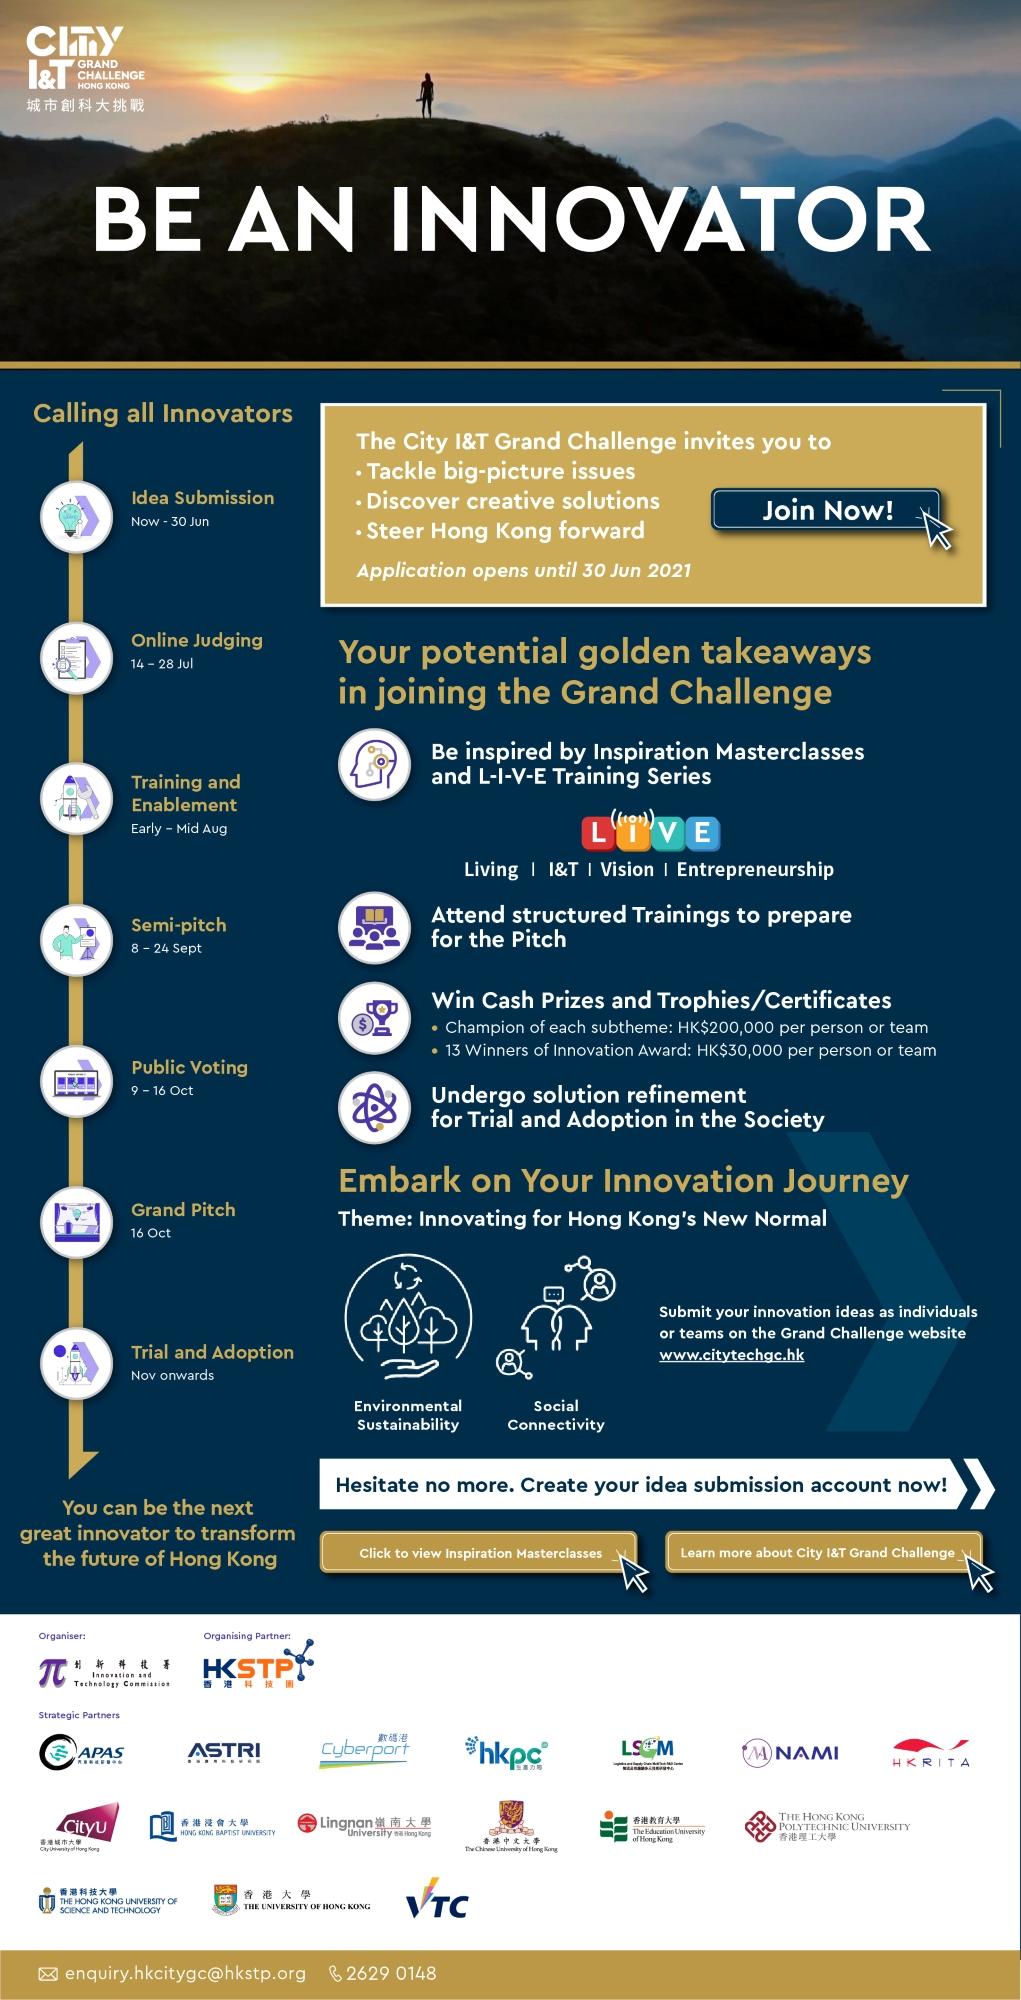 read City I&T Grand Challenge (Application Deadline: 30 June 2021)